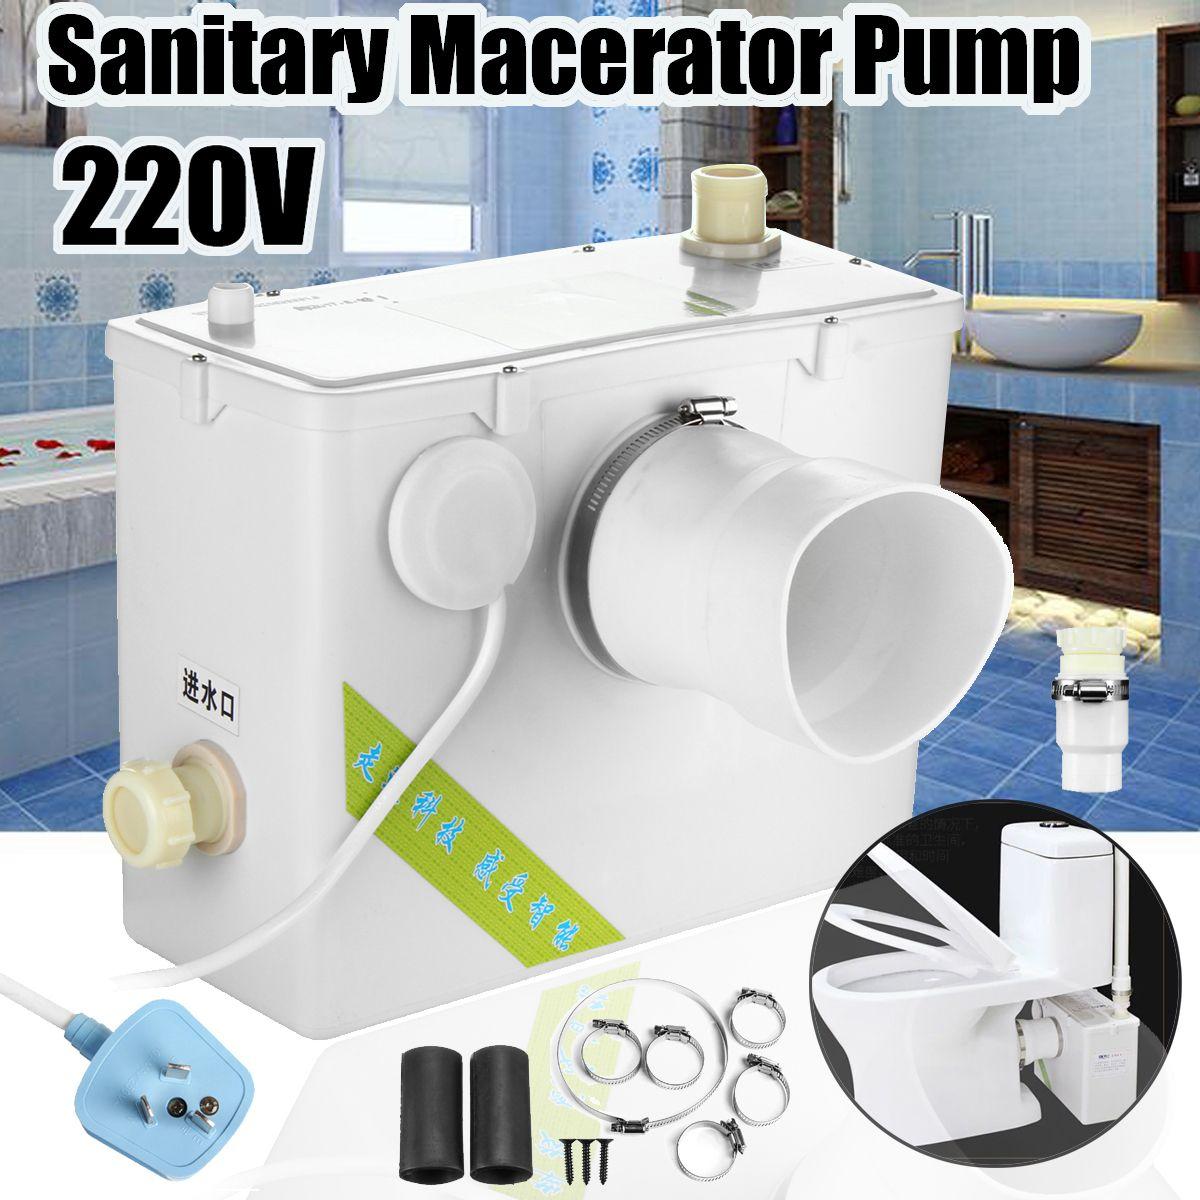 2 Style 400W Sanitary Macerator Pump Auto Disposal Crush Waste Water Bath Toilet Sink